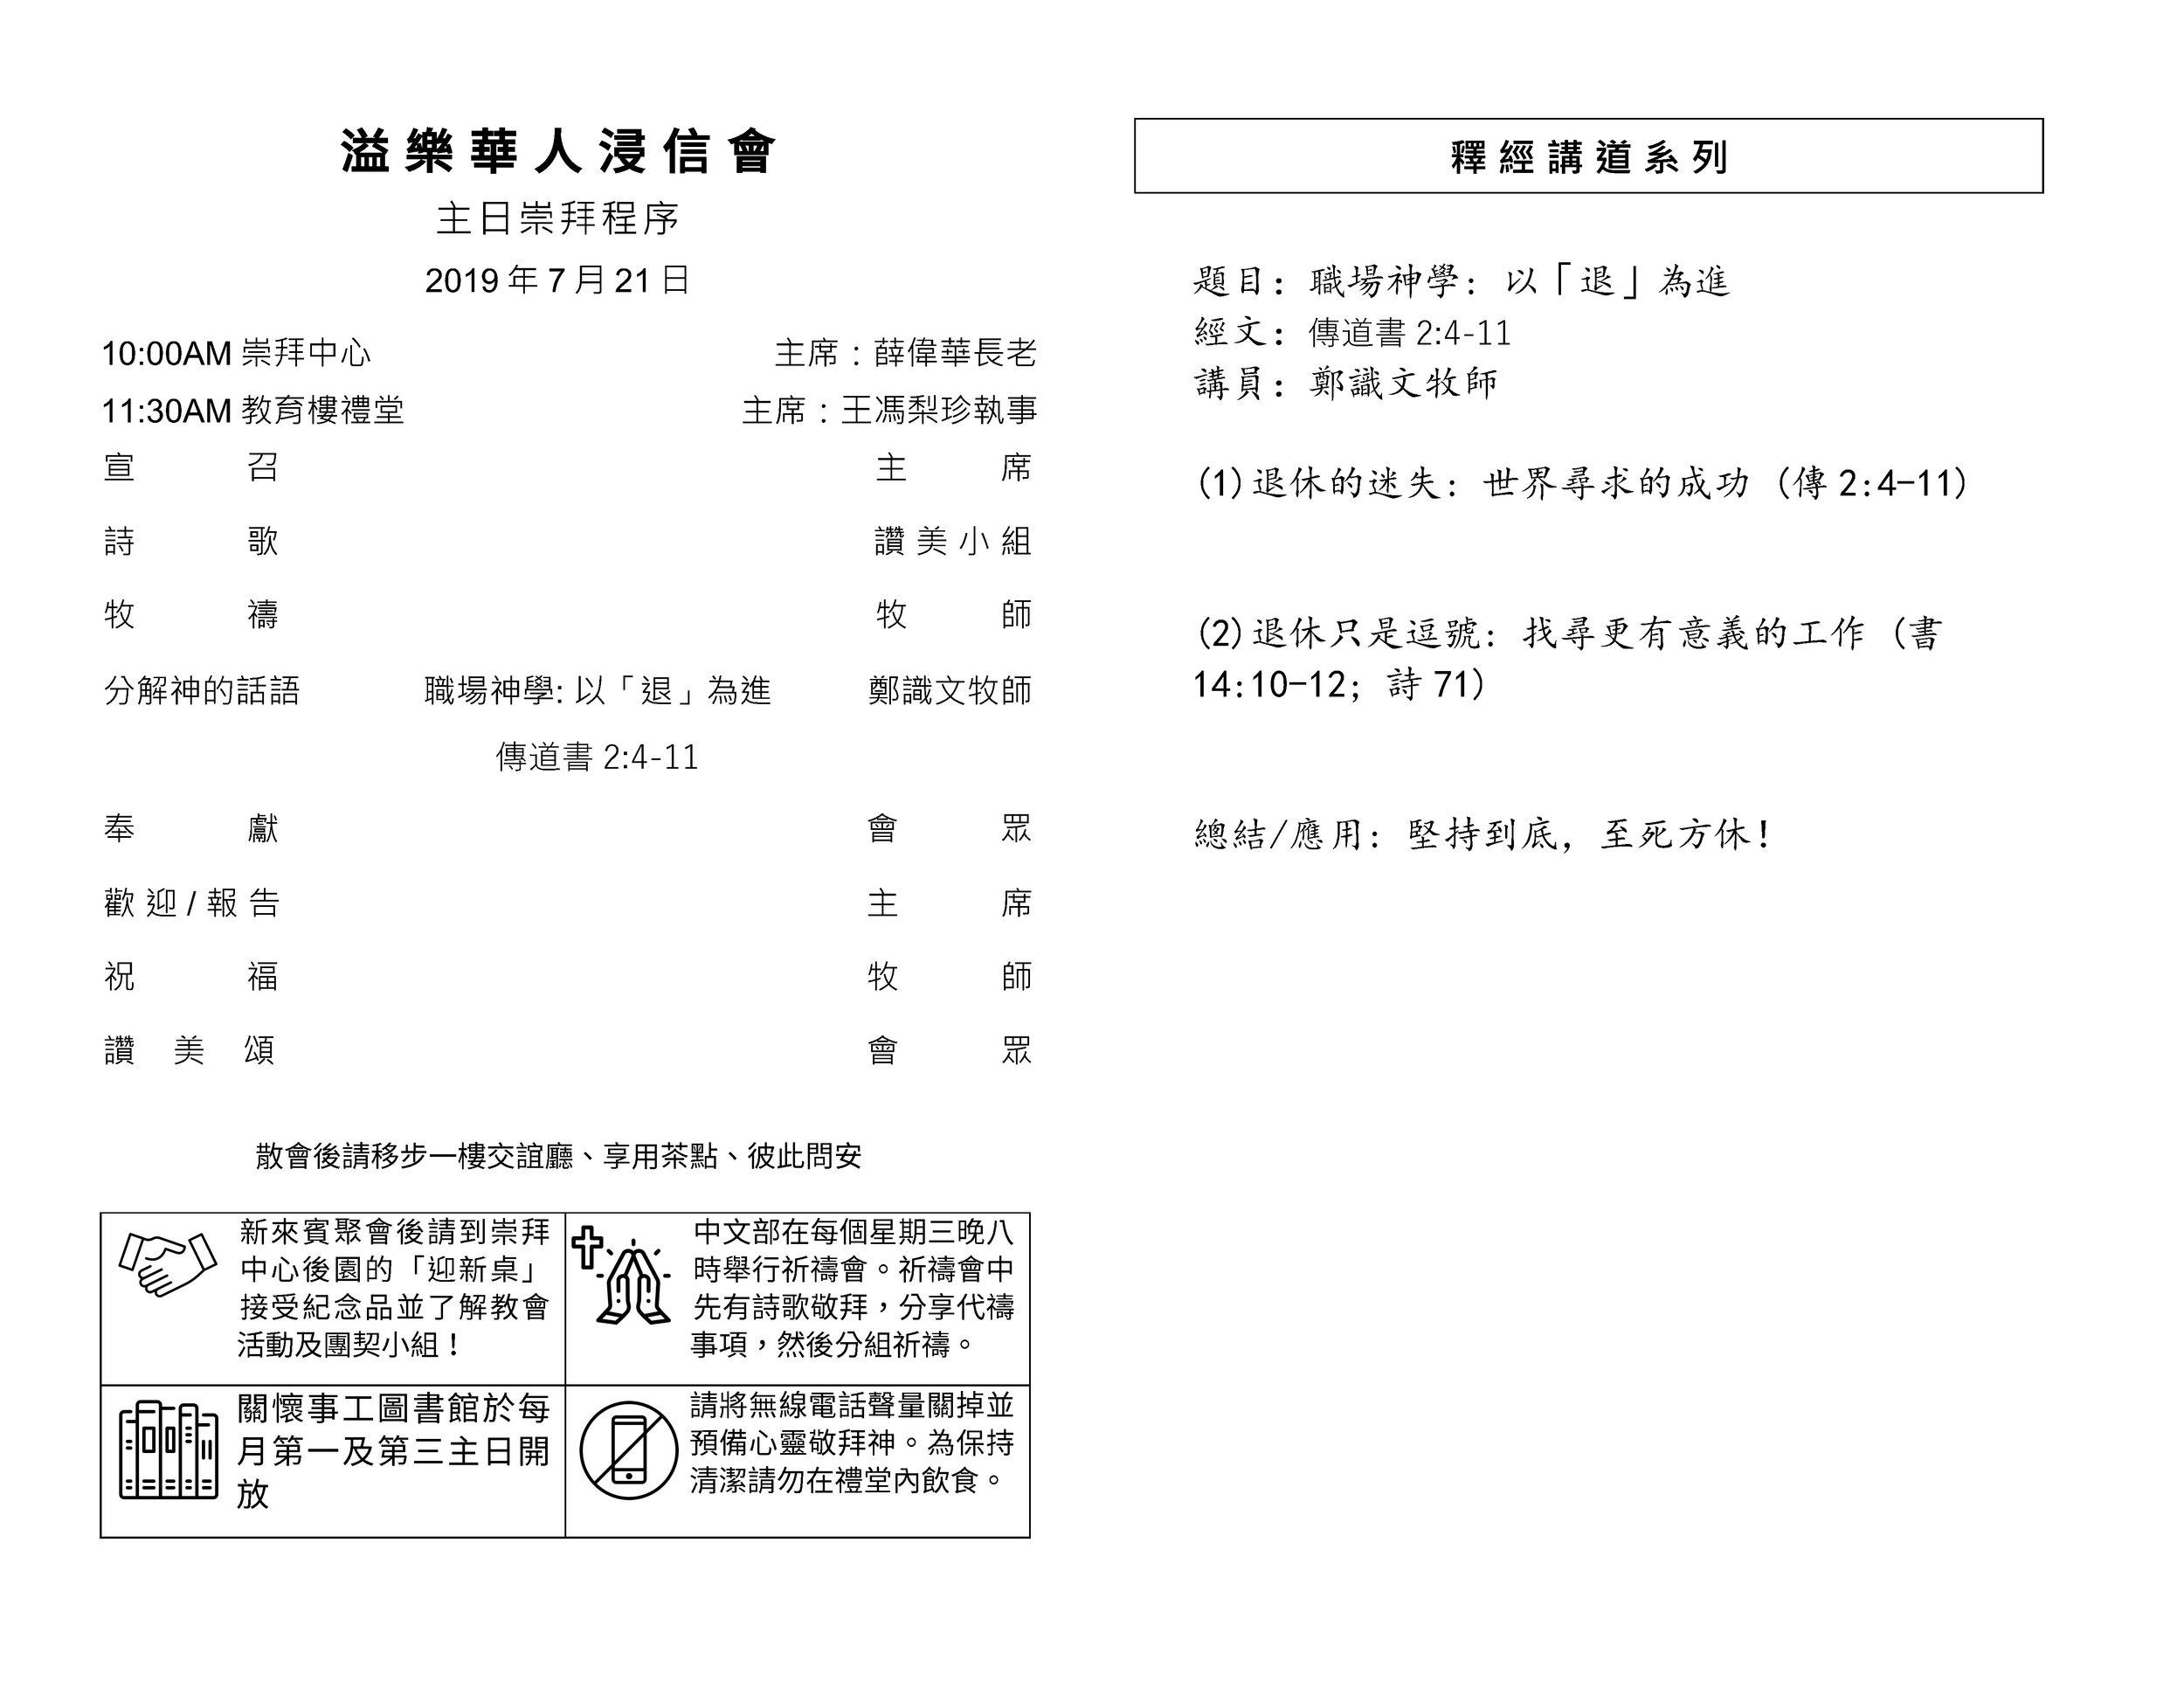 Chinese Bulletin 2019-7-21_Page_2.jpg